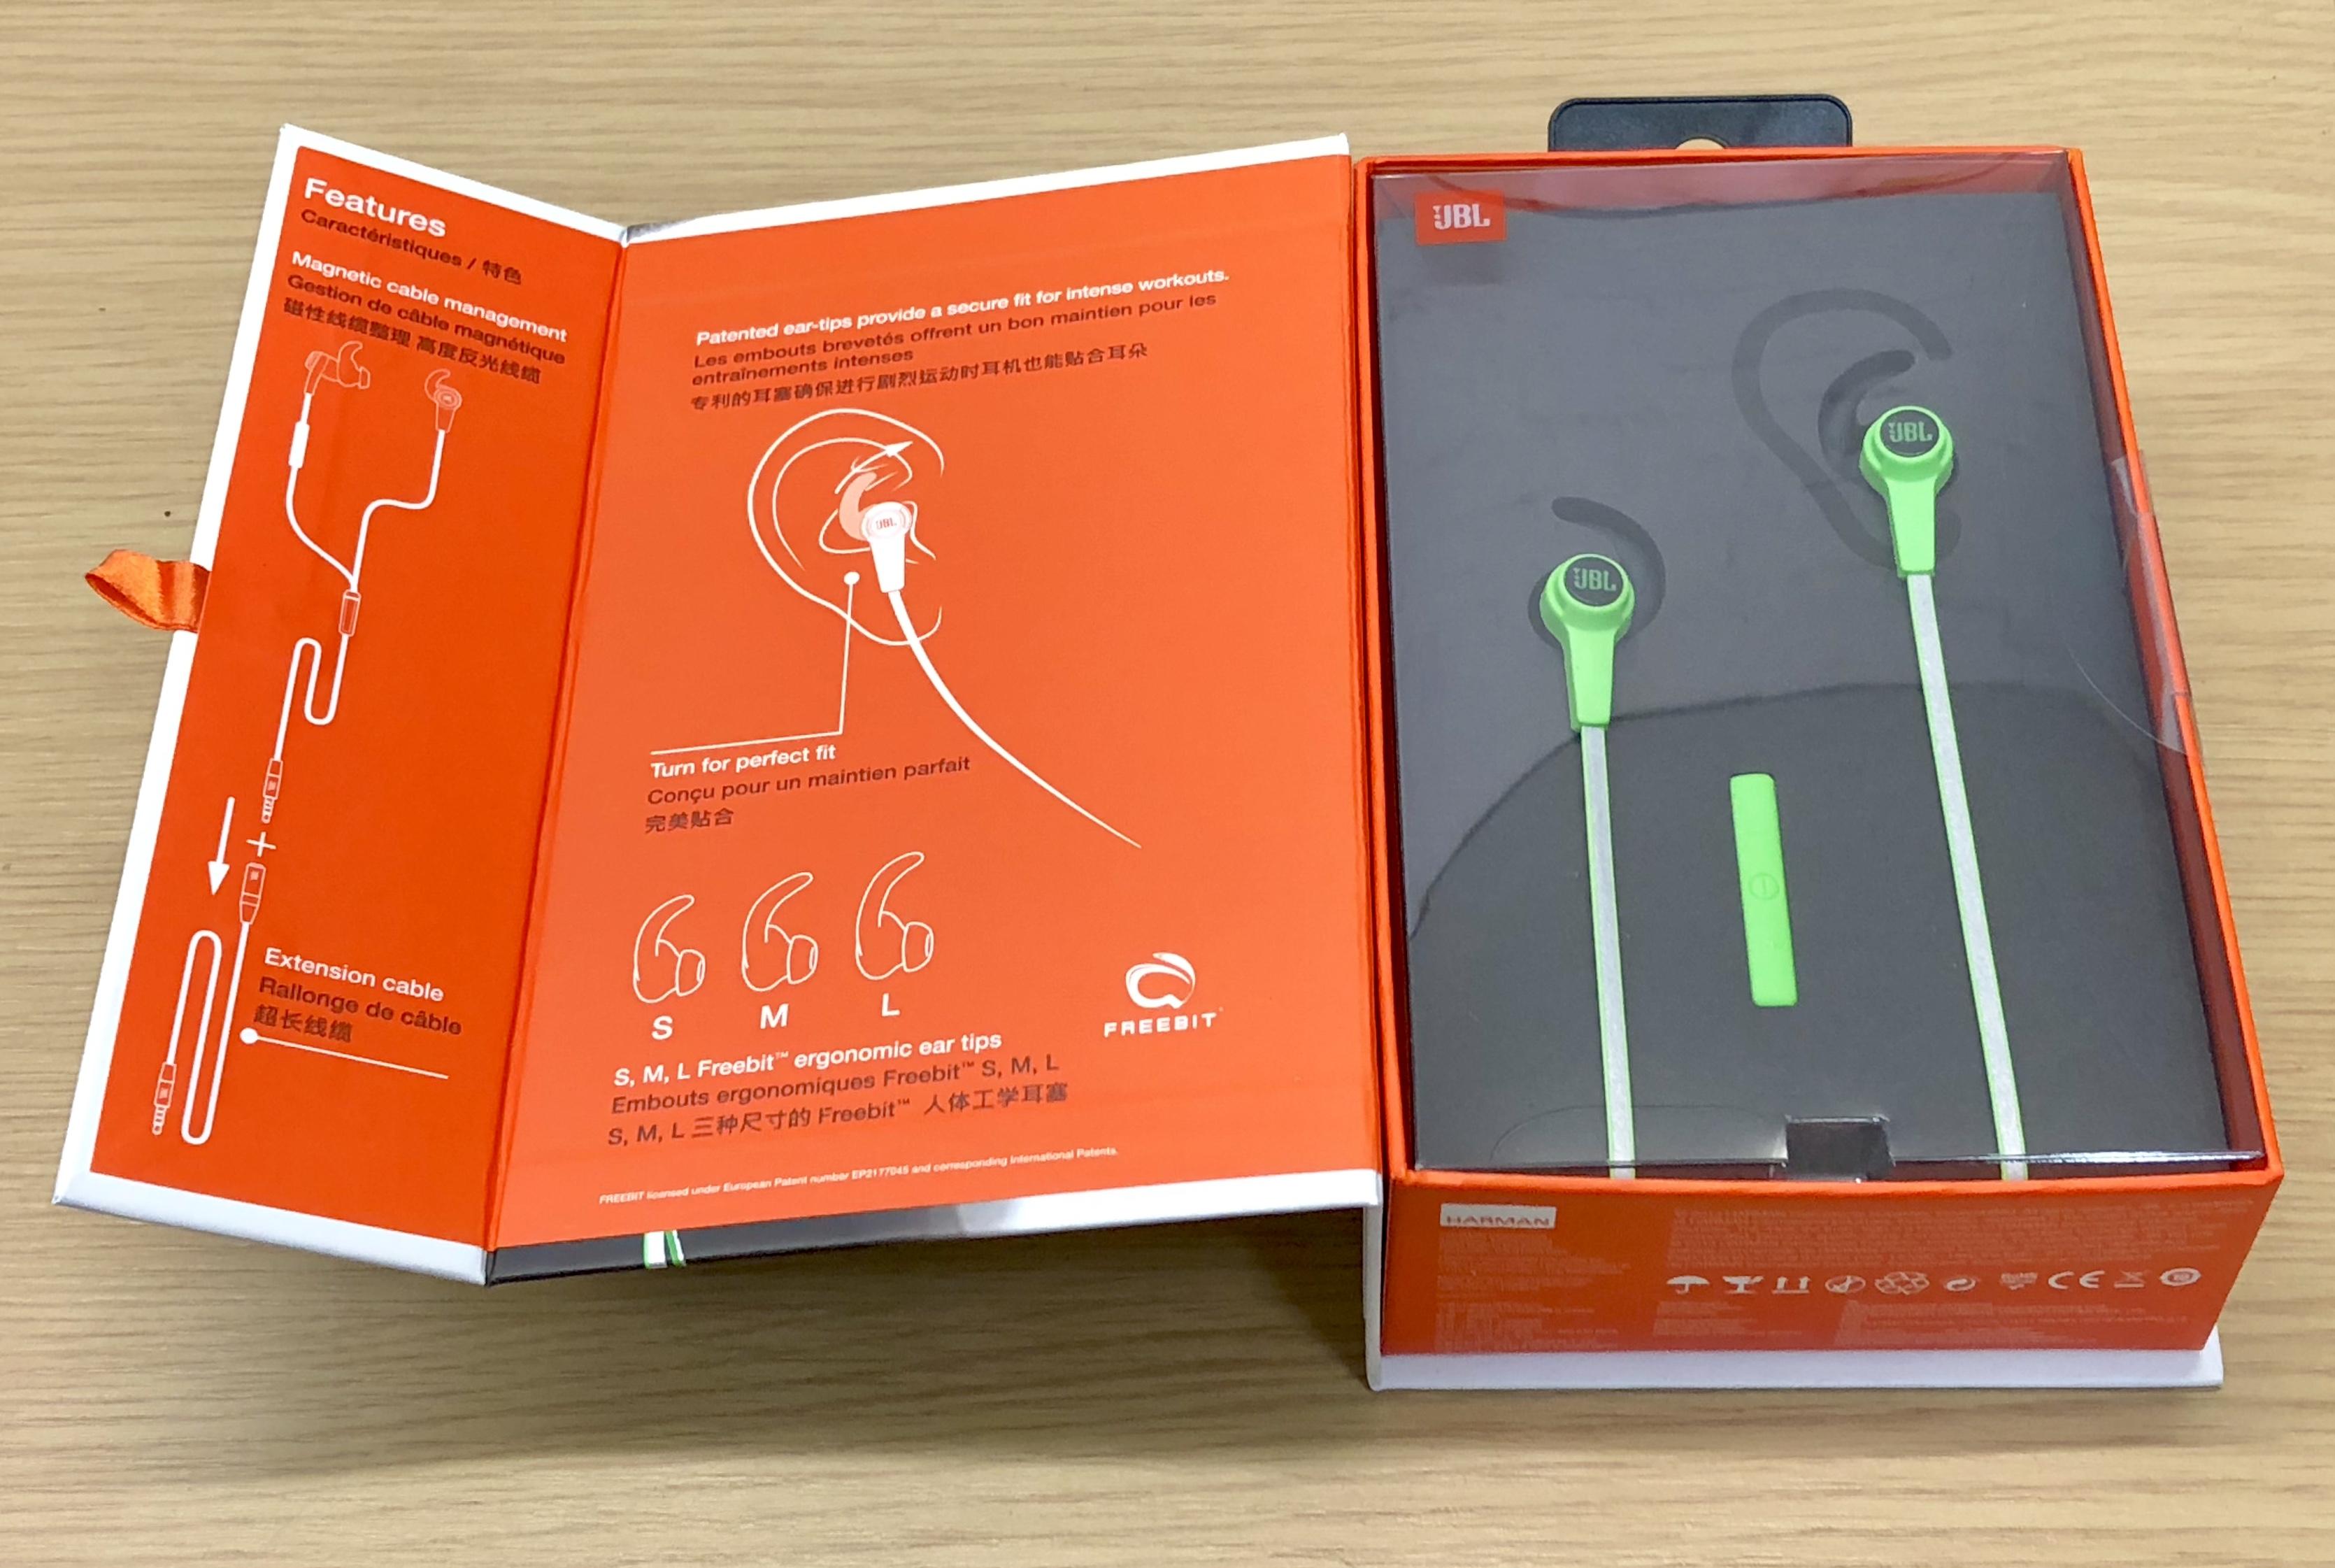 Lot 50022 - V Brand New JBL Synchros Reflect In-Ear Sport Headphones - ISP £59.00 (Mobicity UK) - Reflective for